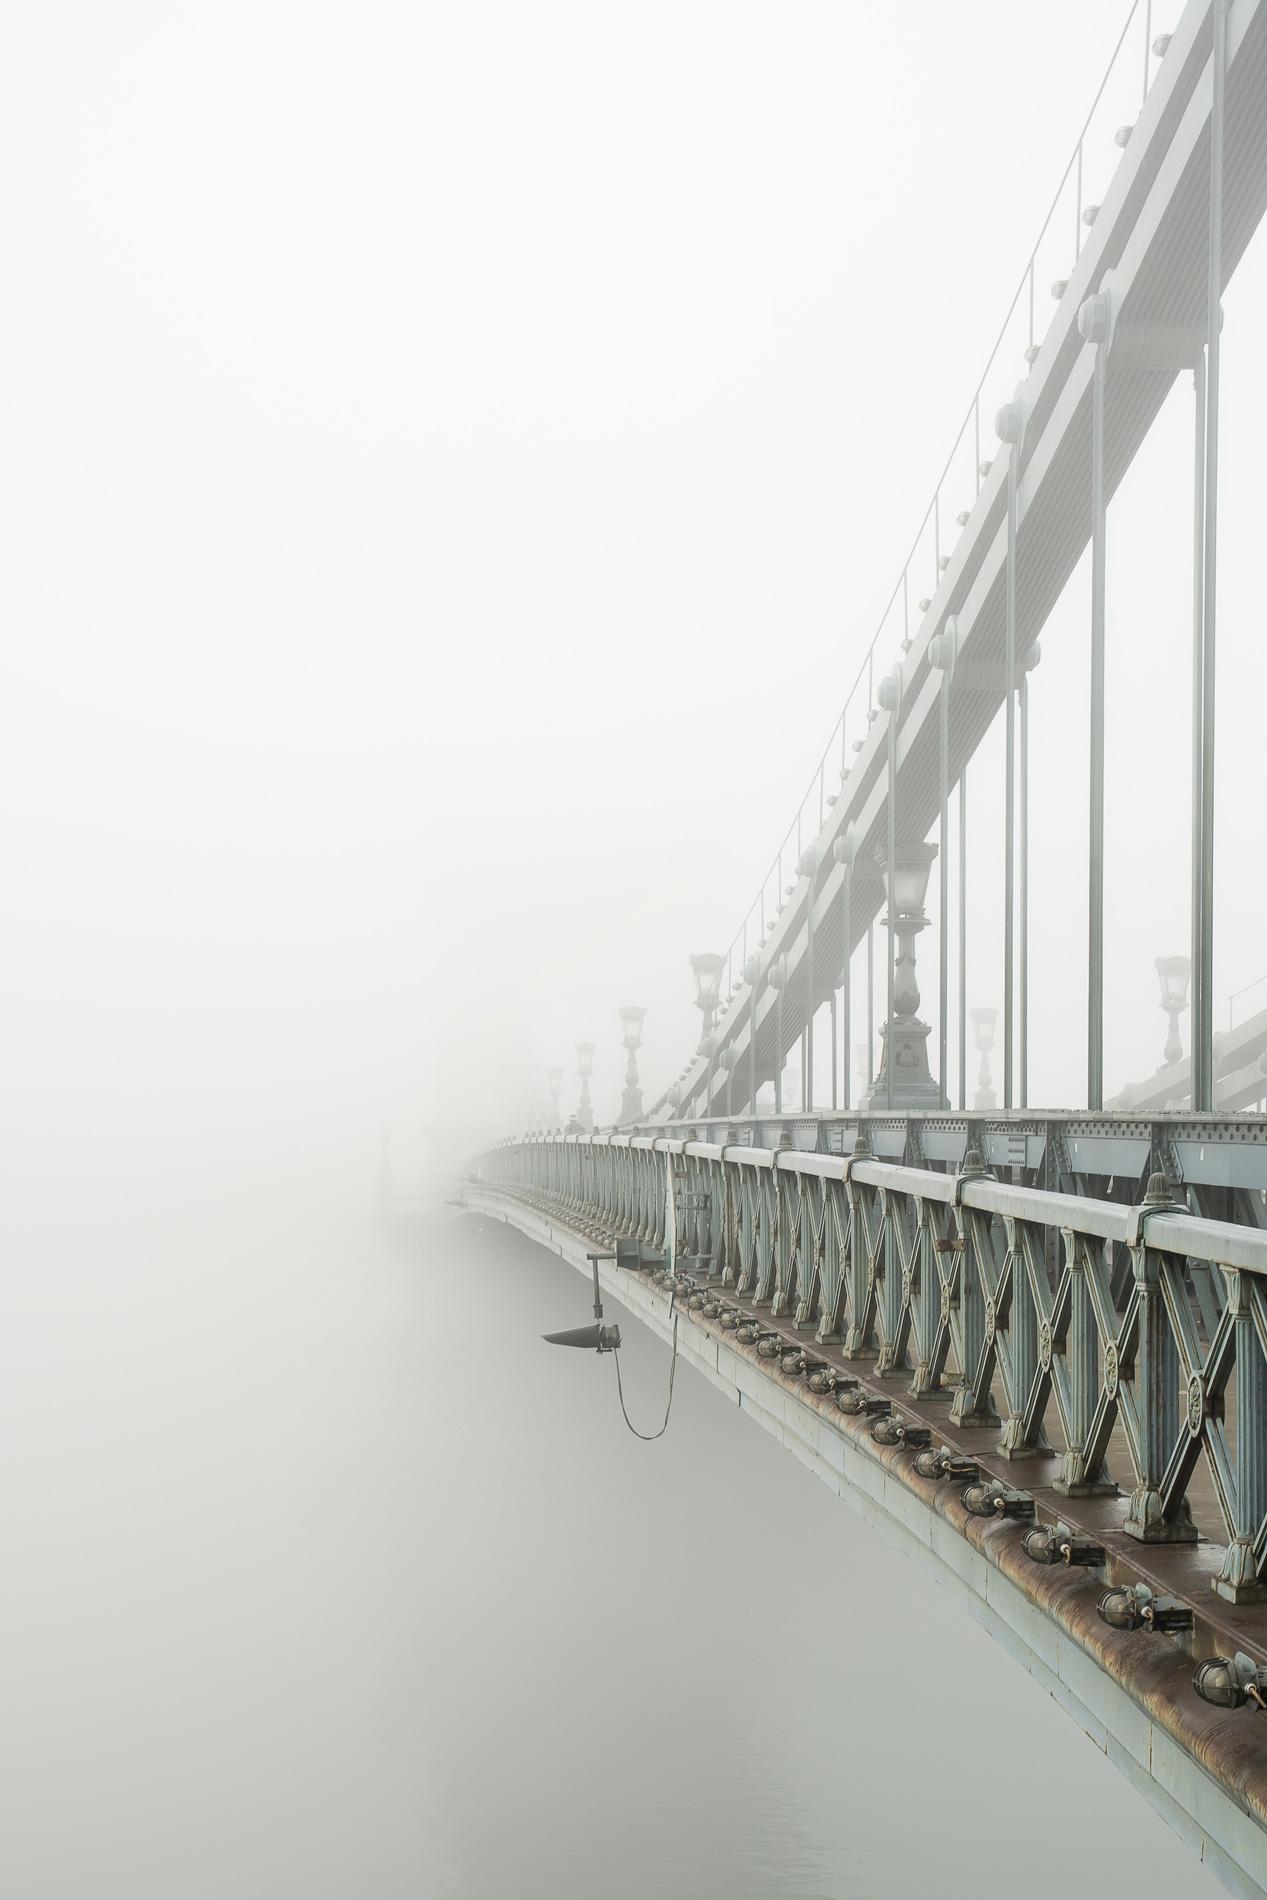 budapest_atthary_photography_bridge_28